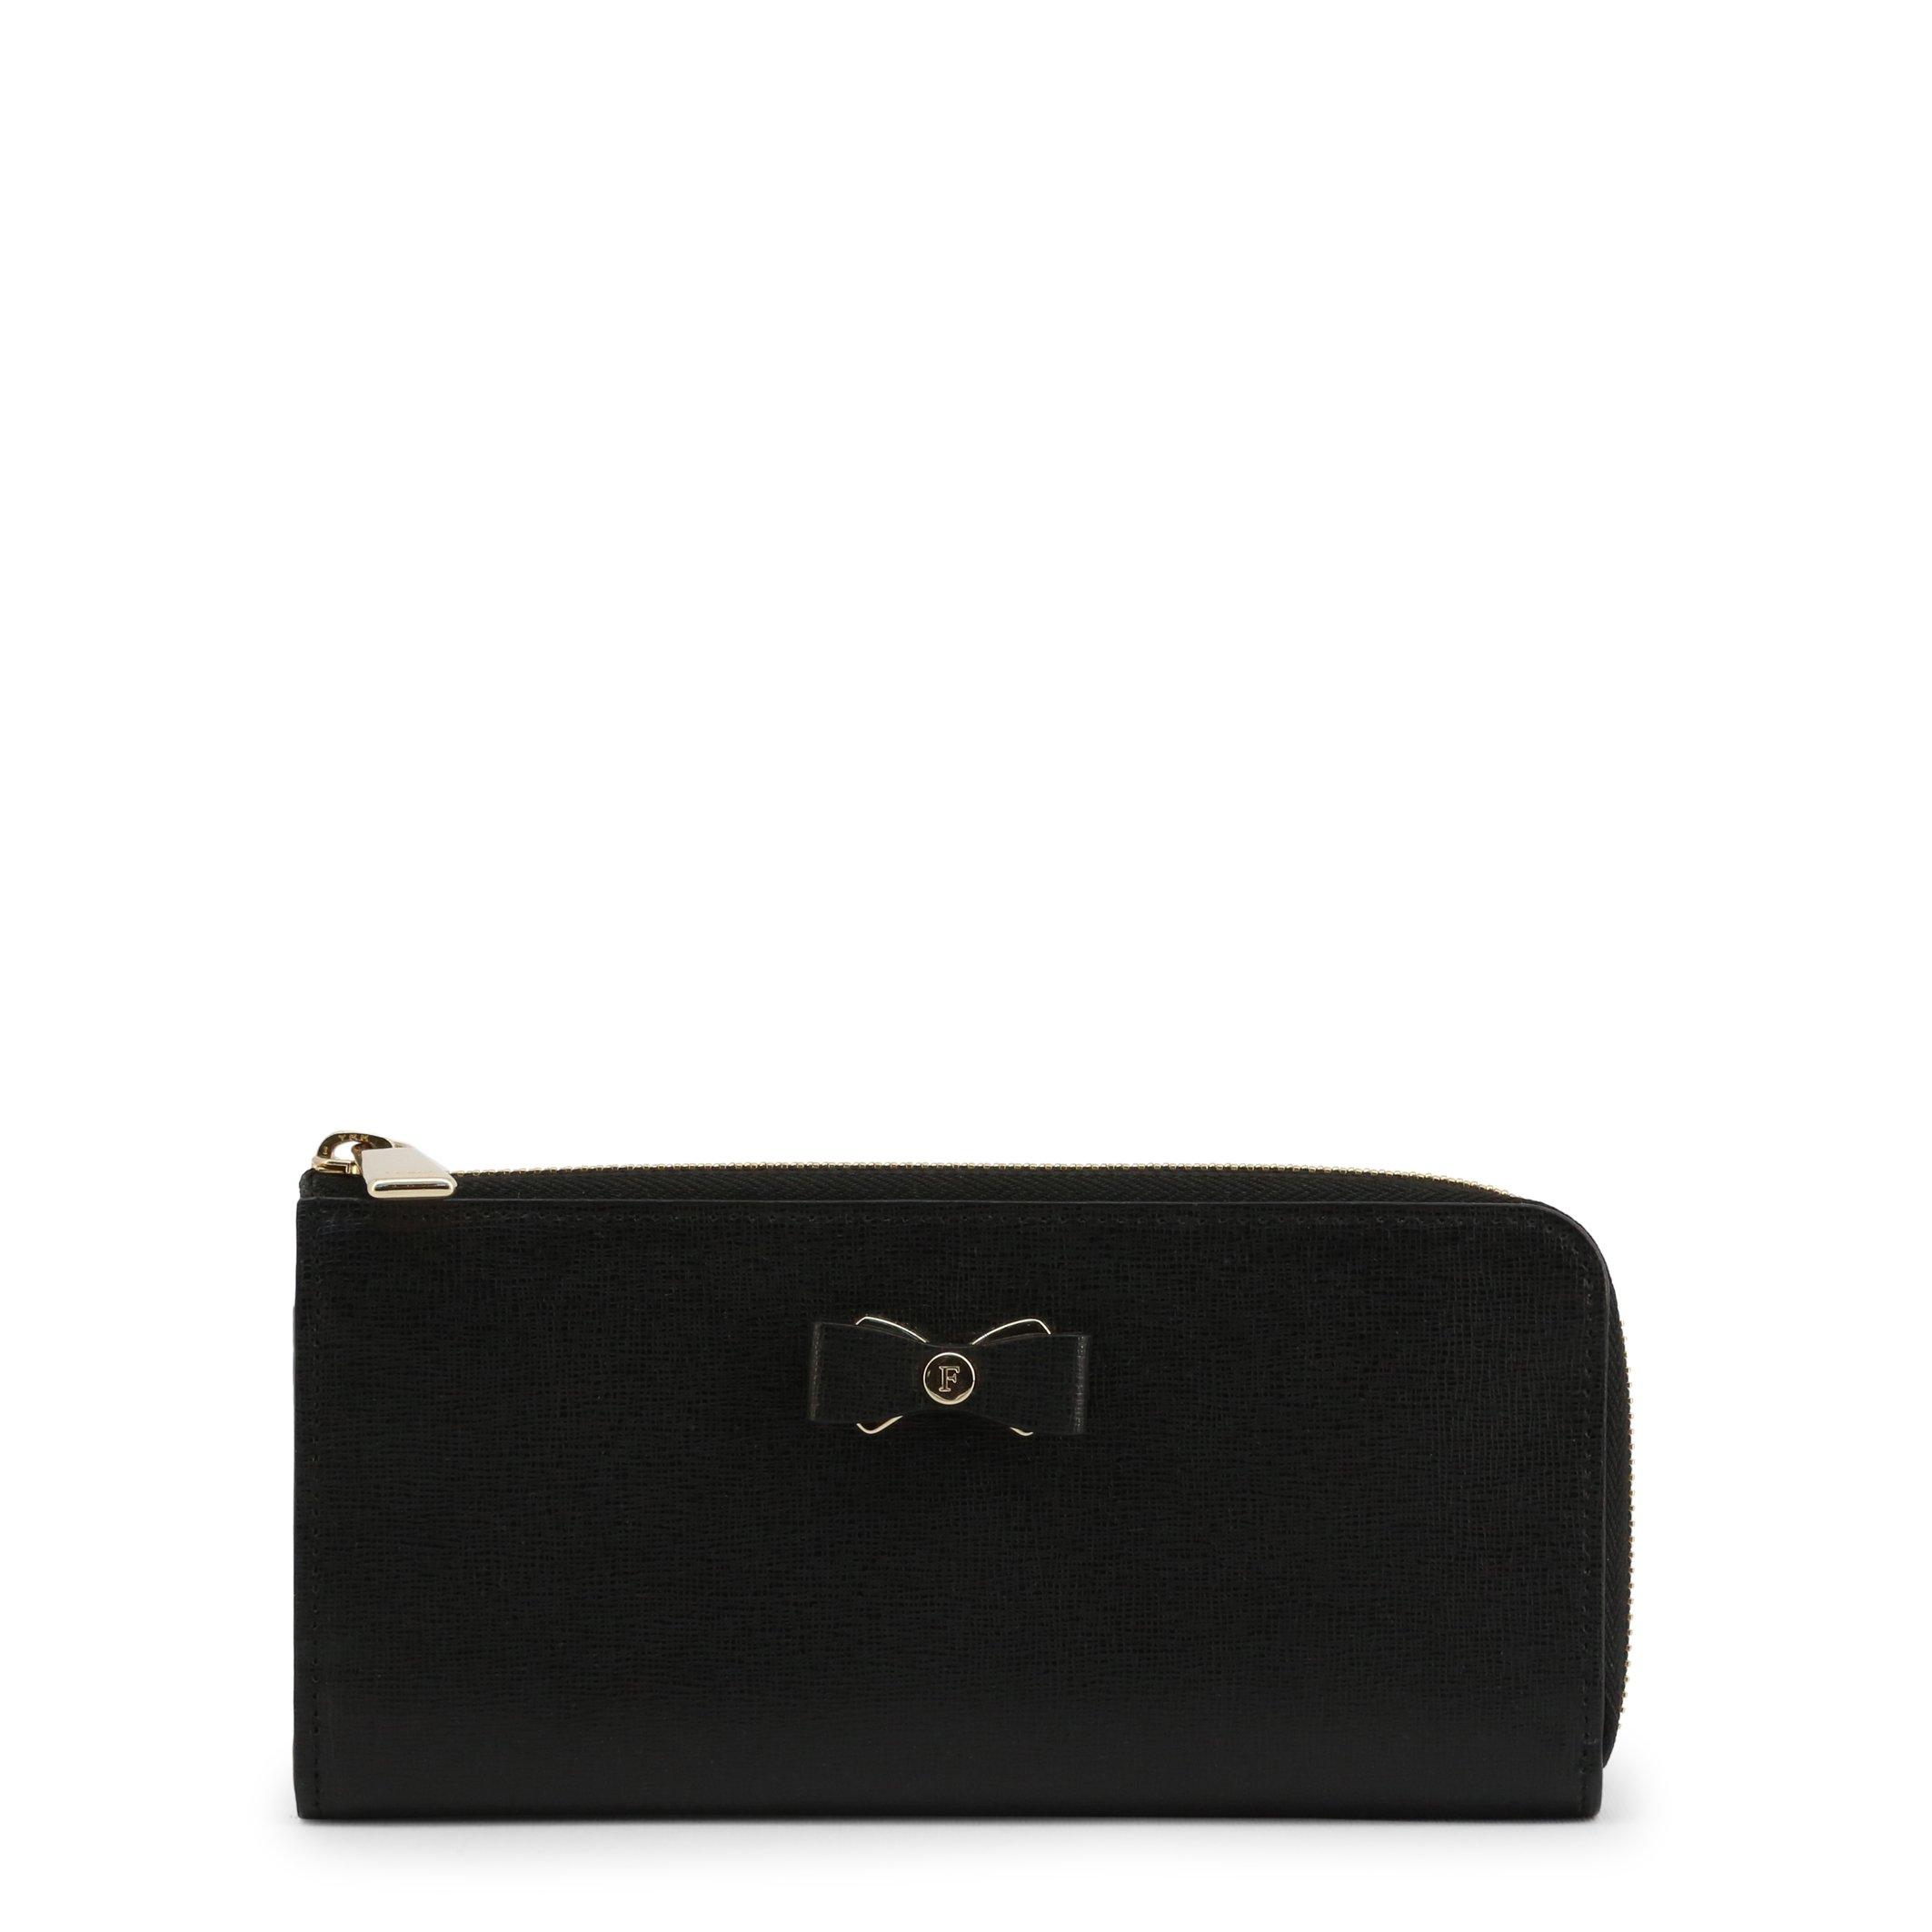 Furla Women's Wallet Various Colours PAU4_GLENDA - black NOSIZE